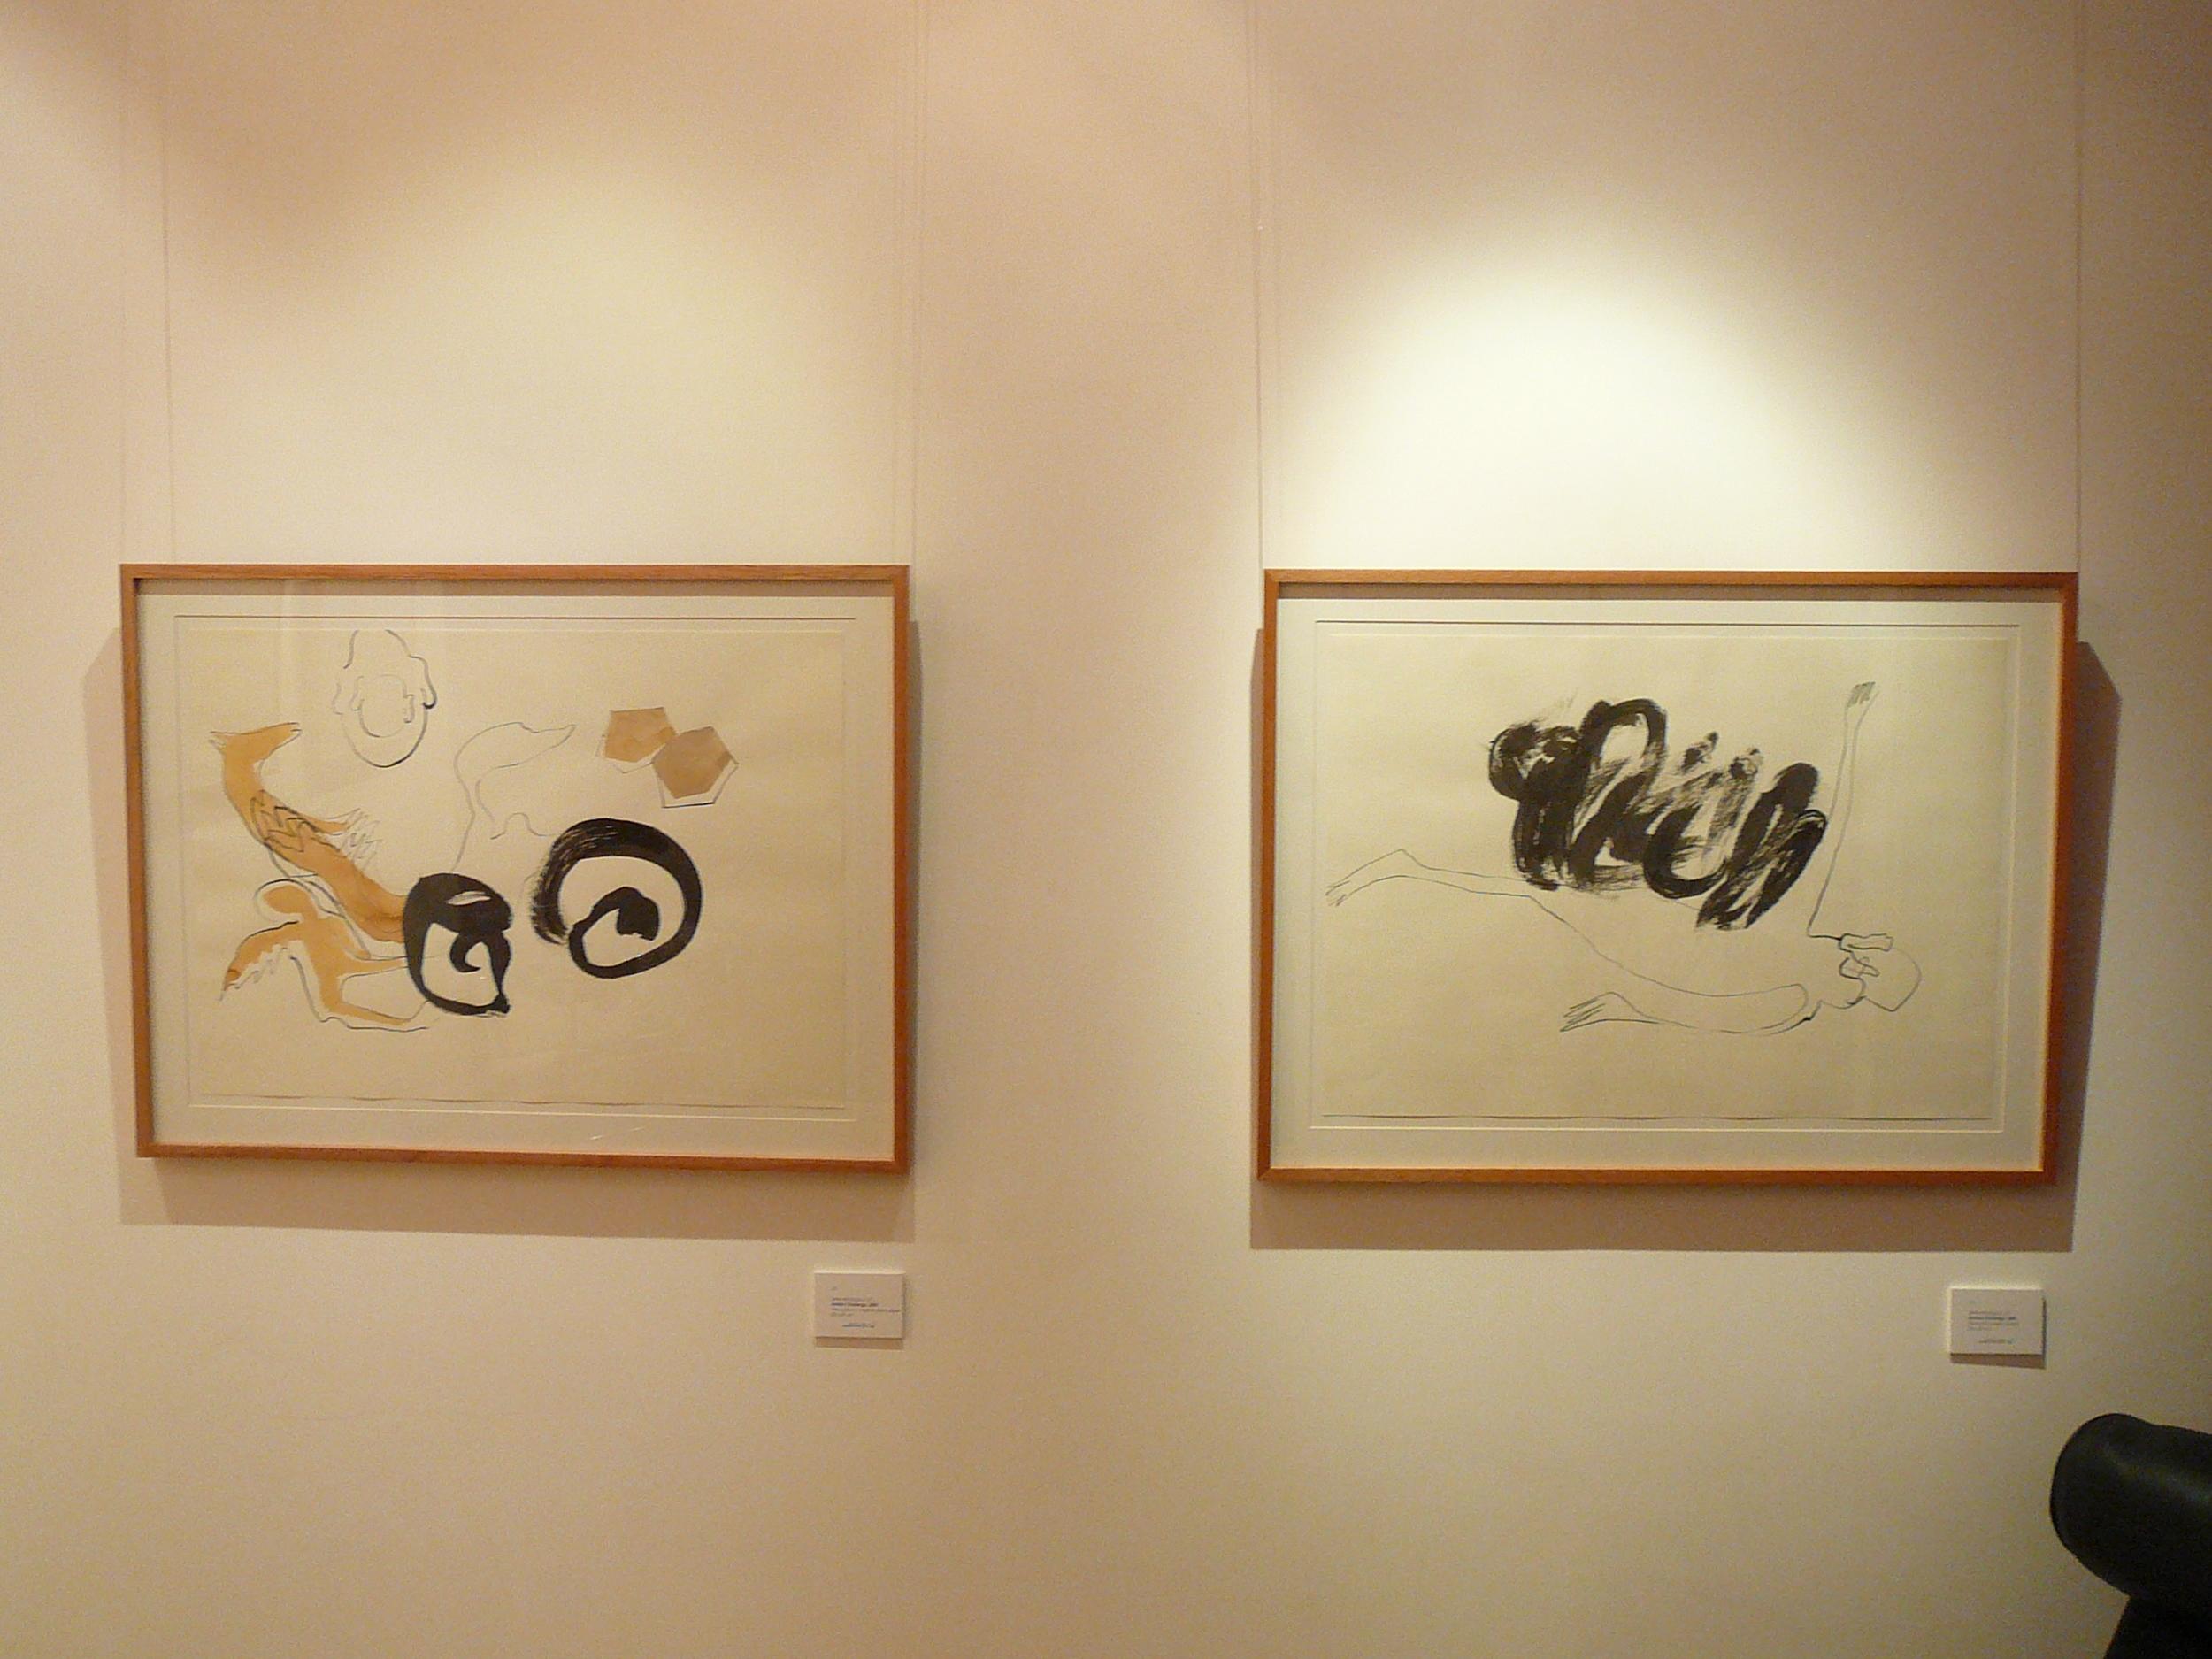 Cholango expo 2014 030 (5).JPG